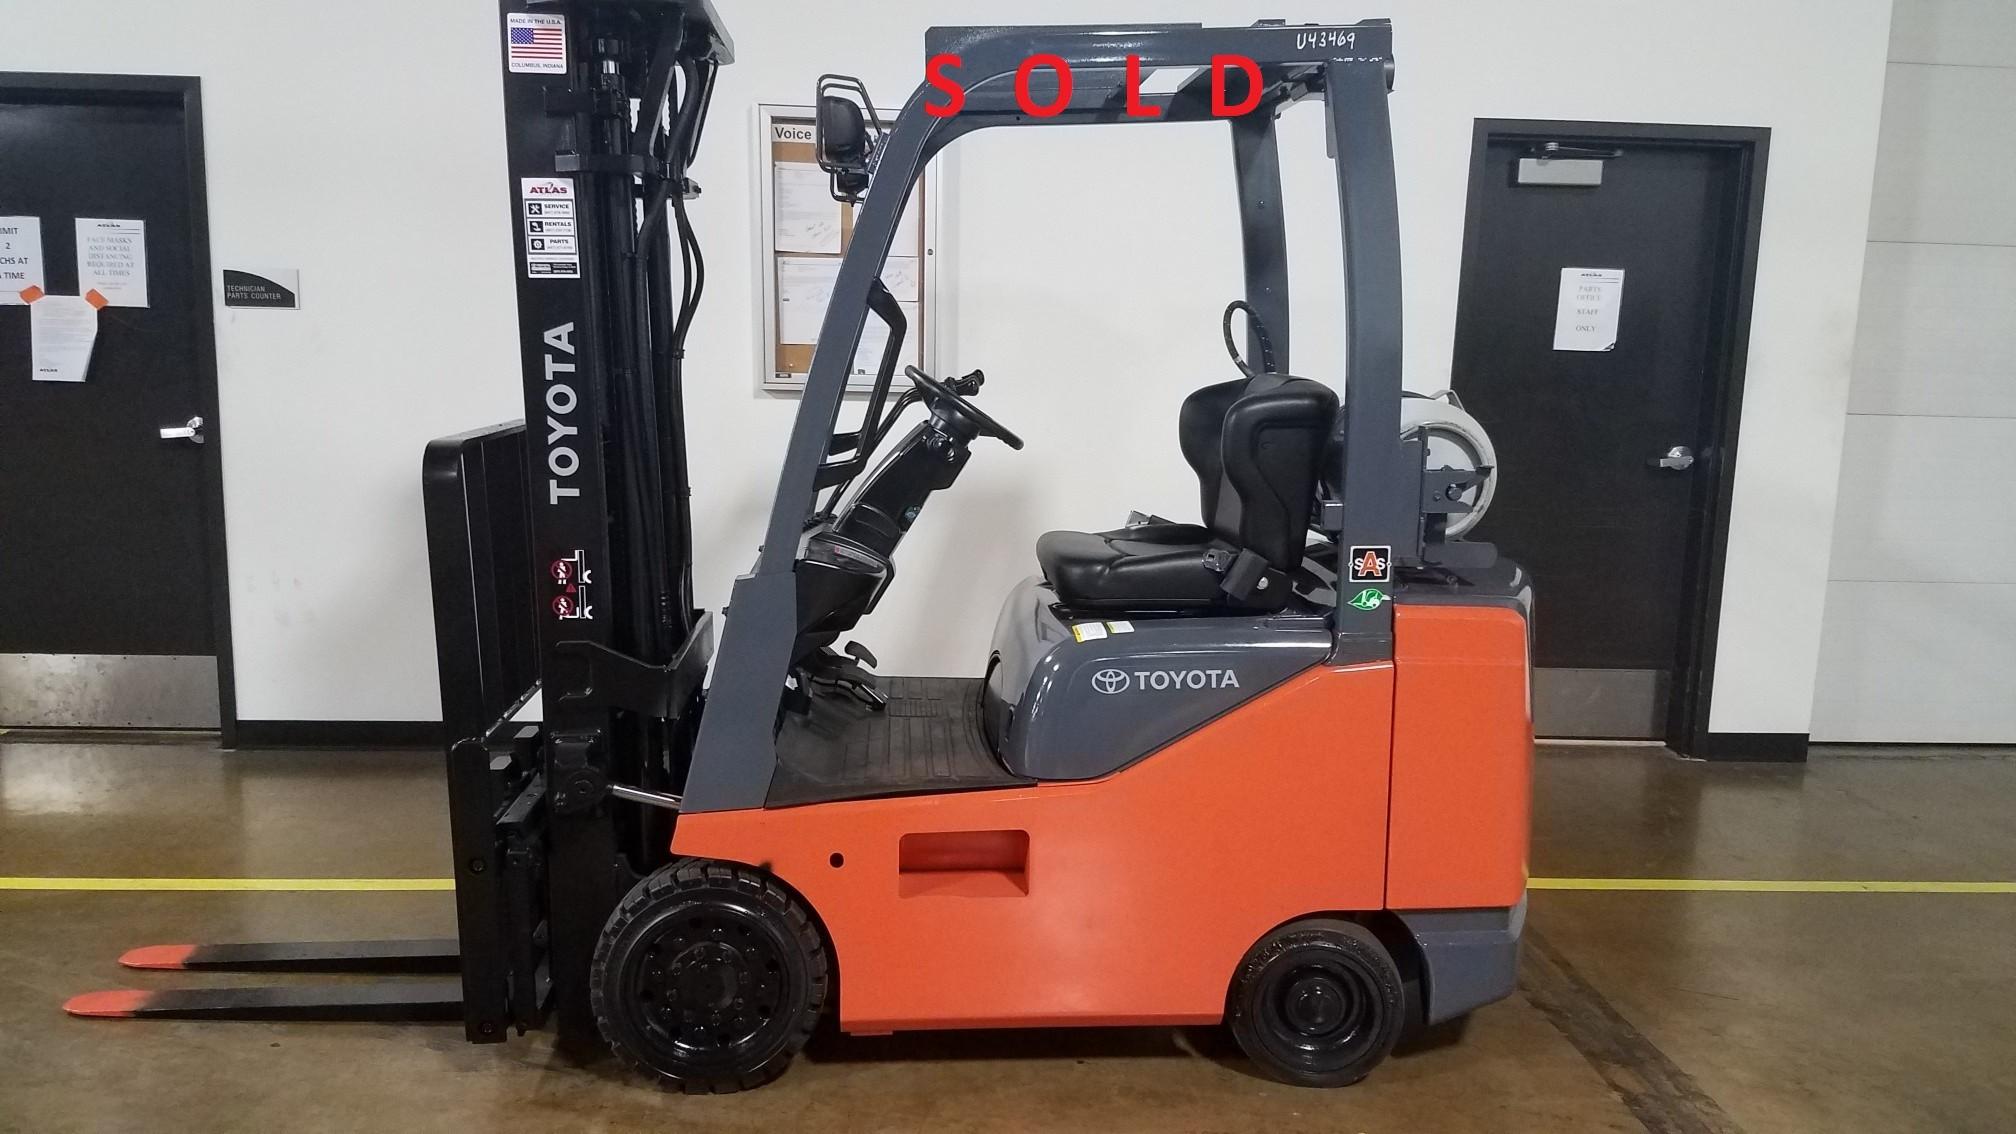 Used, 2017, Toyota Industrial Equipment, 8FGCSU20, Forklifts / Lift Trucks